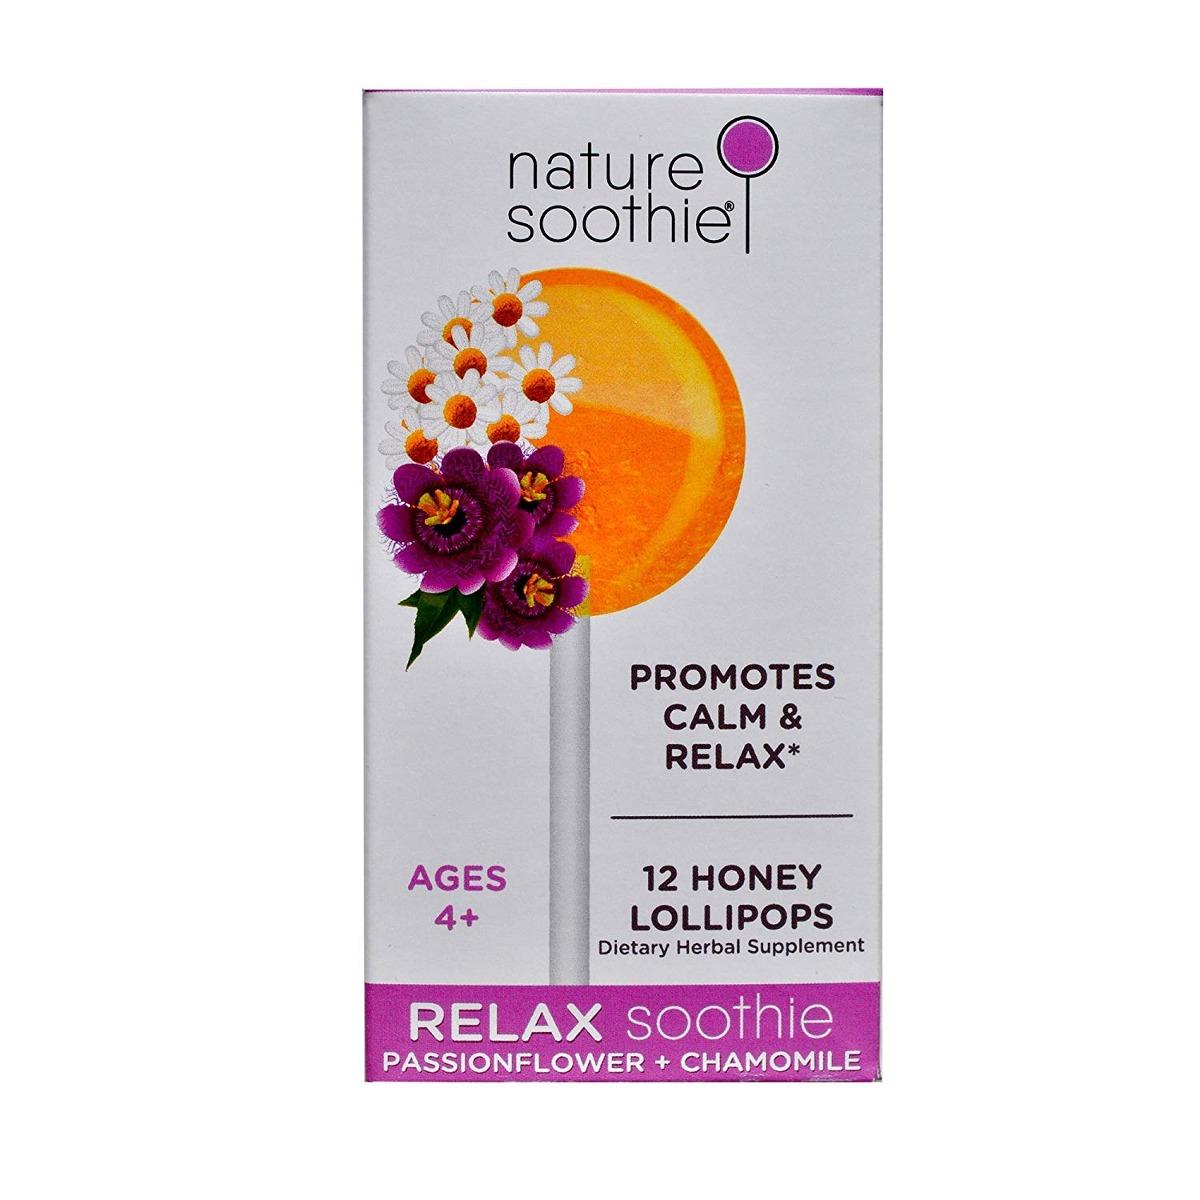 La Naturaleza Soothie Relax Totalmente Natural Lollipop, Flo